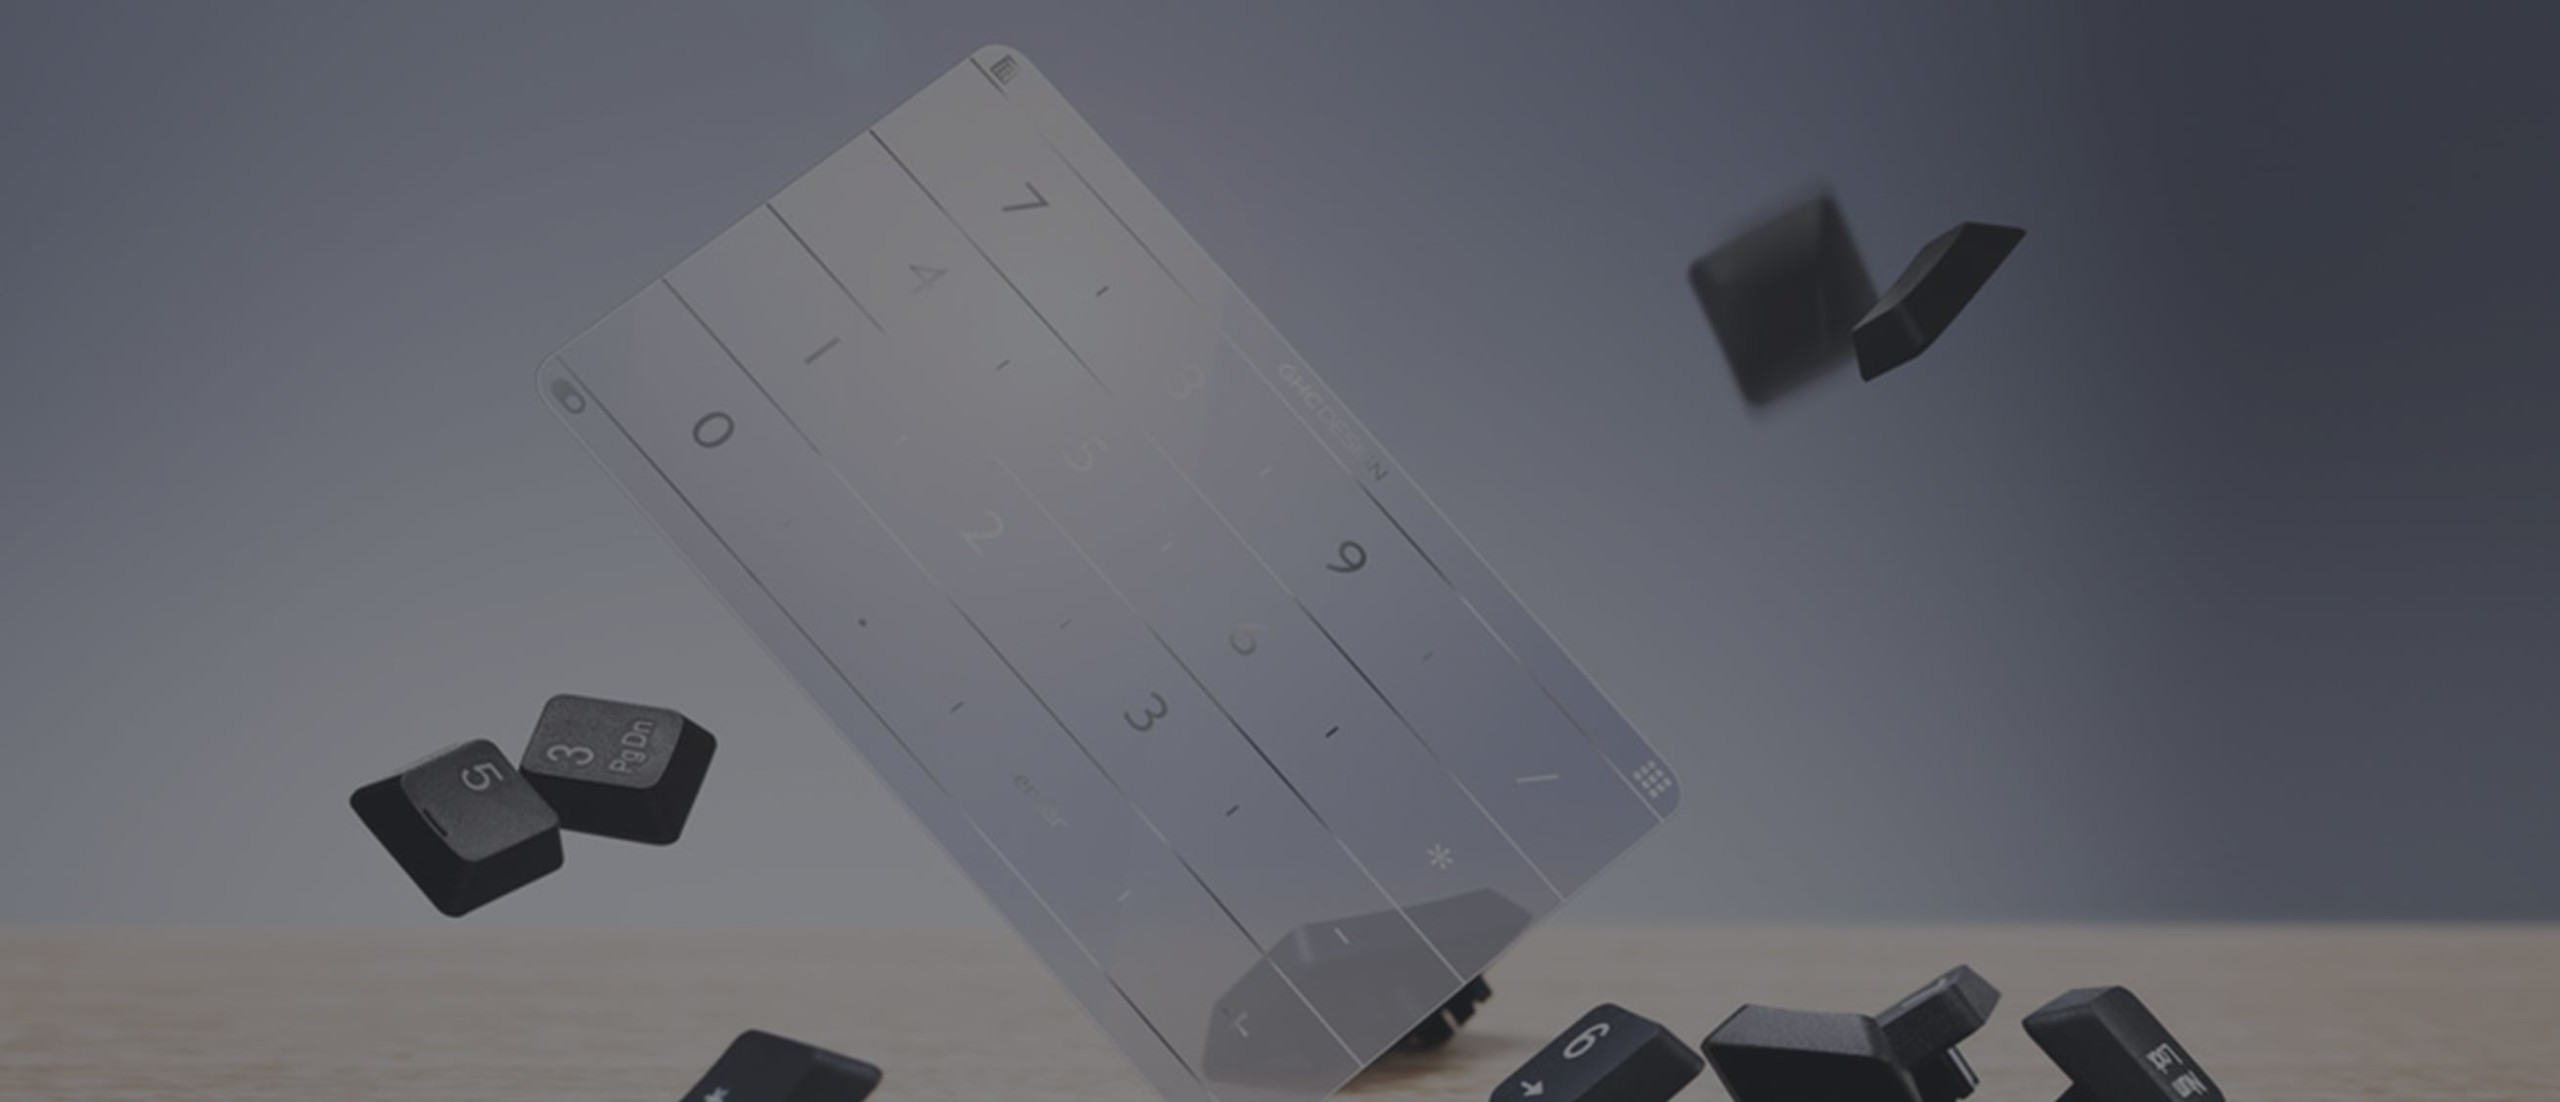 Nums Smart Glass Trackpad Keyboard